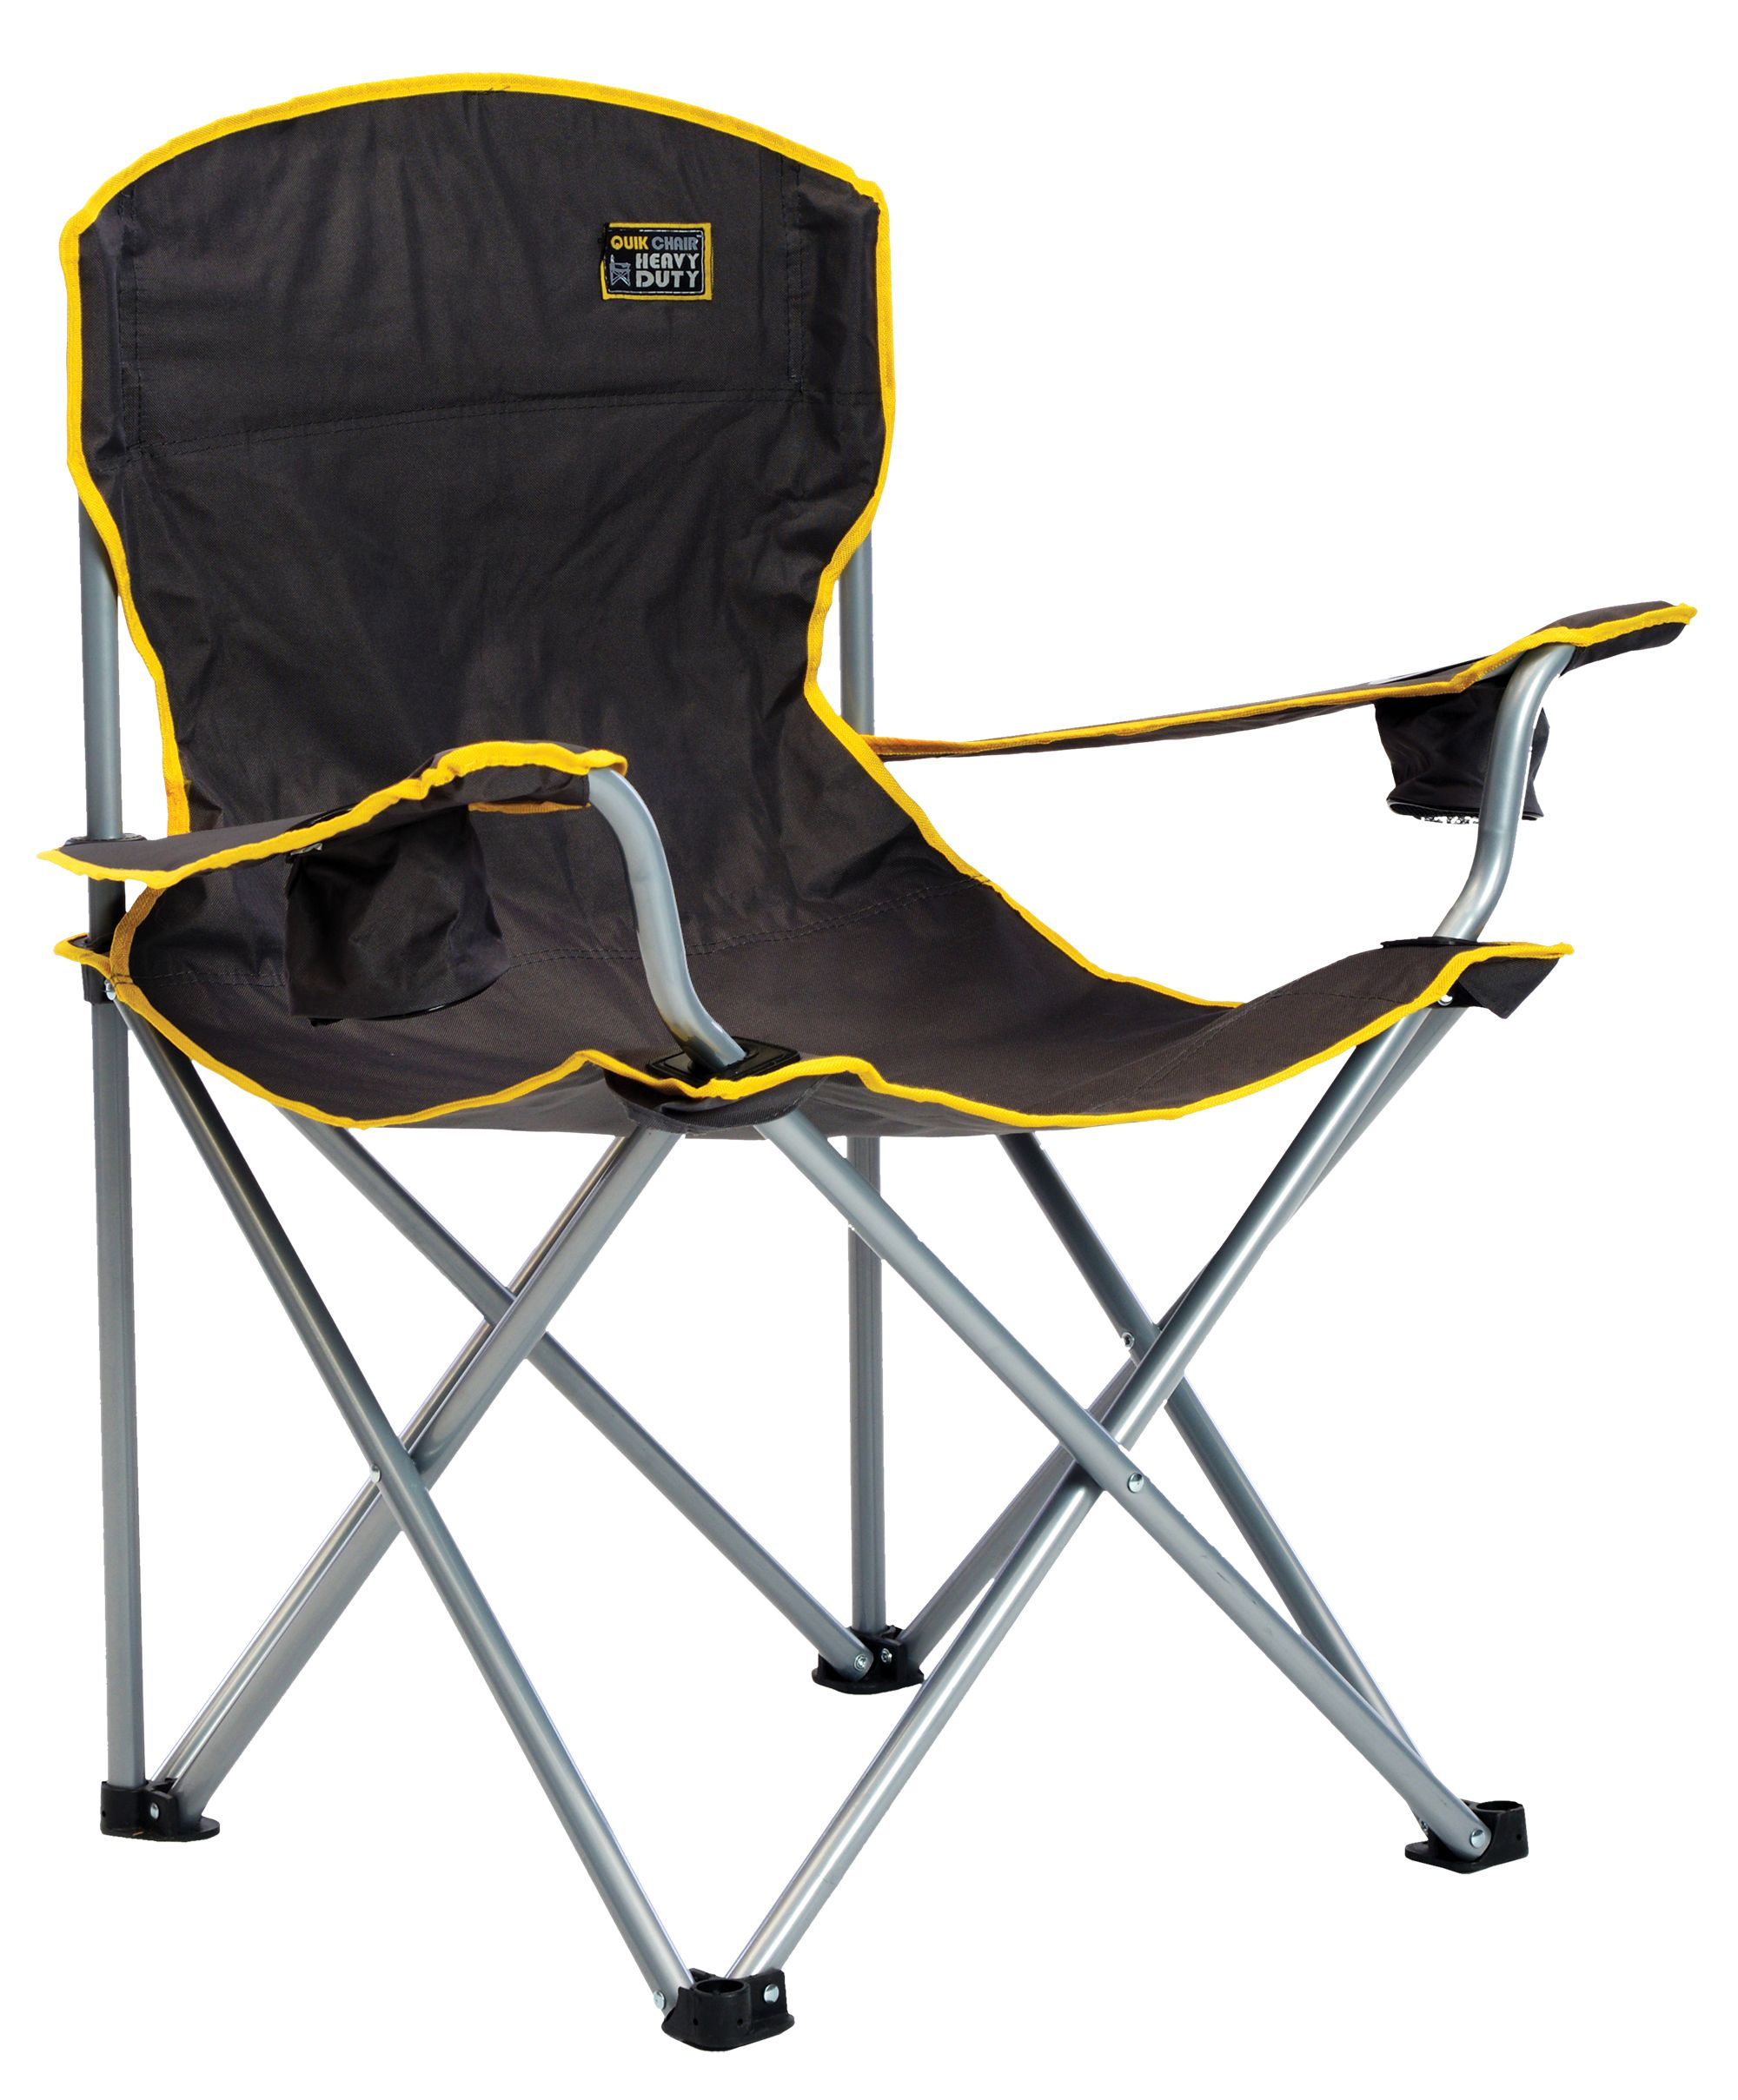 Quik Shade Heavy Duty Folding Chair  Black  Walmartcom